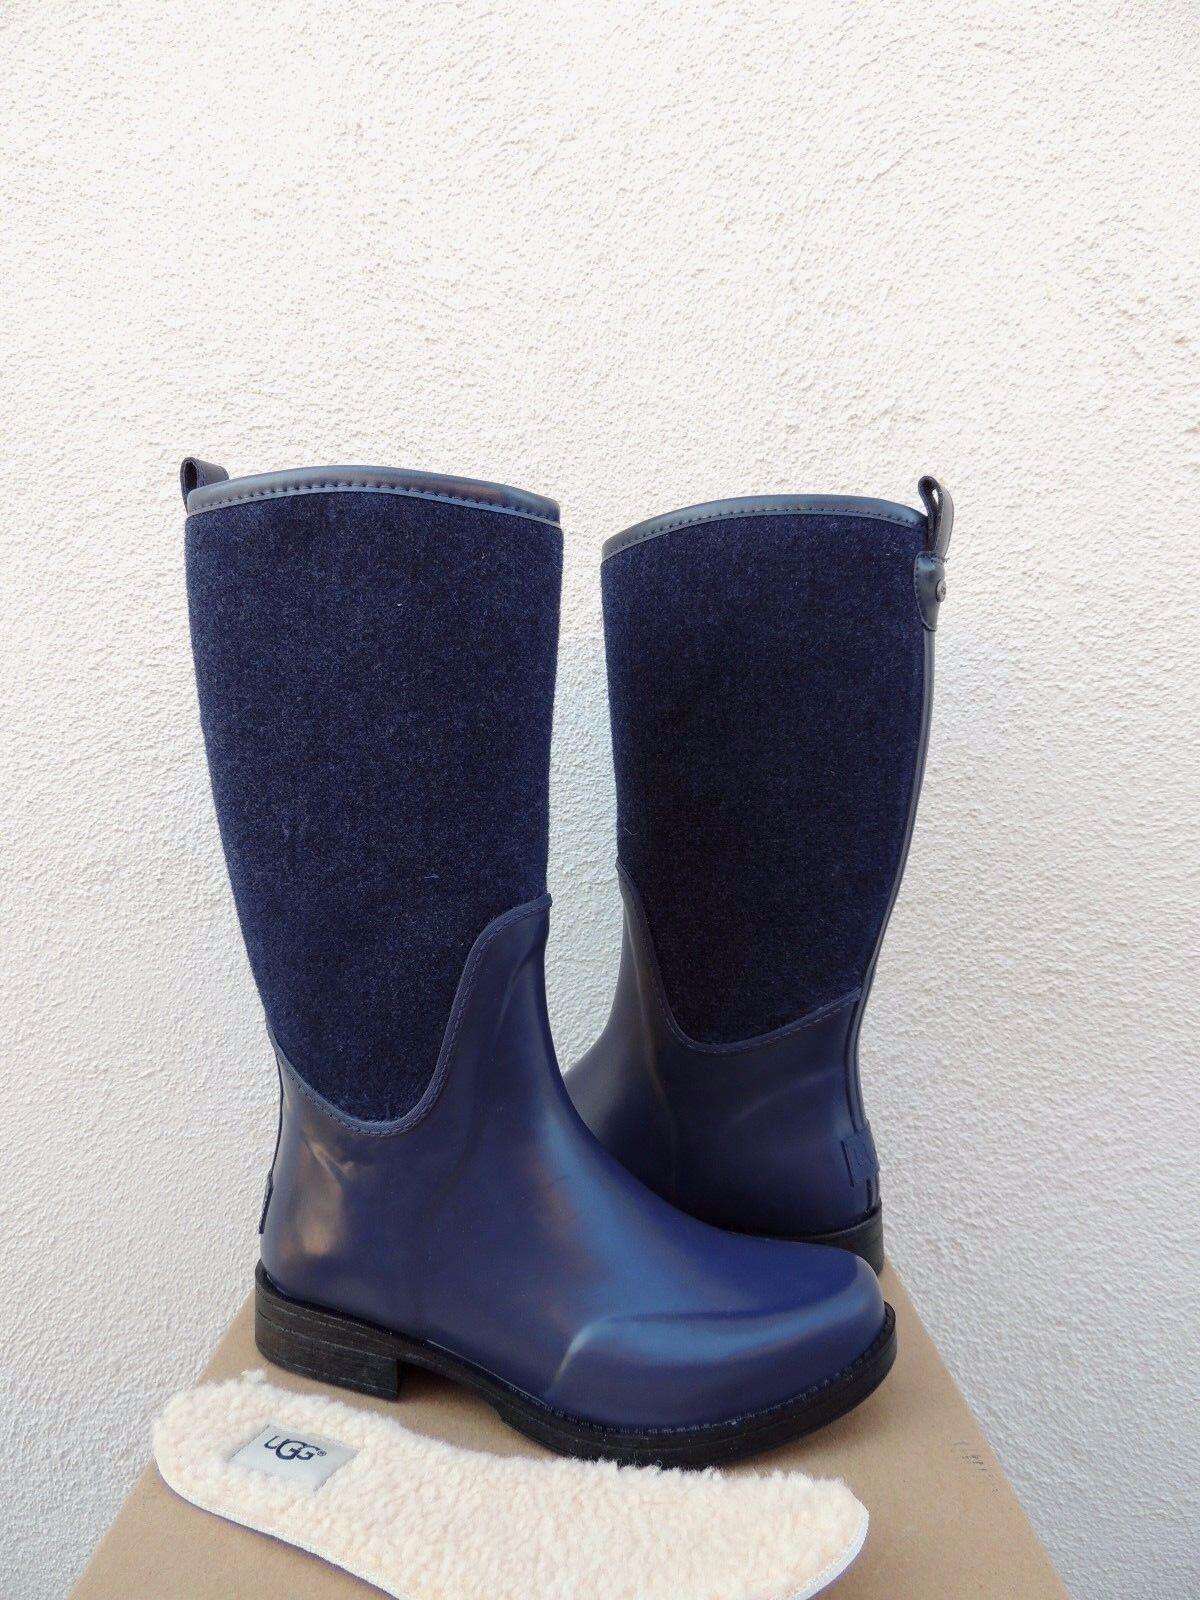 ae41b7007c2 ugg reignfall rain boots reviews